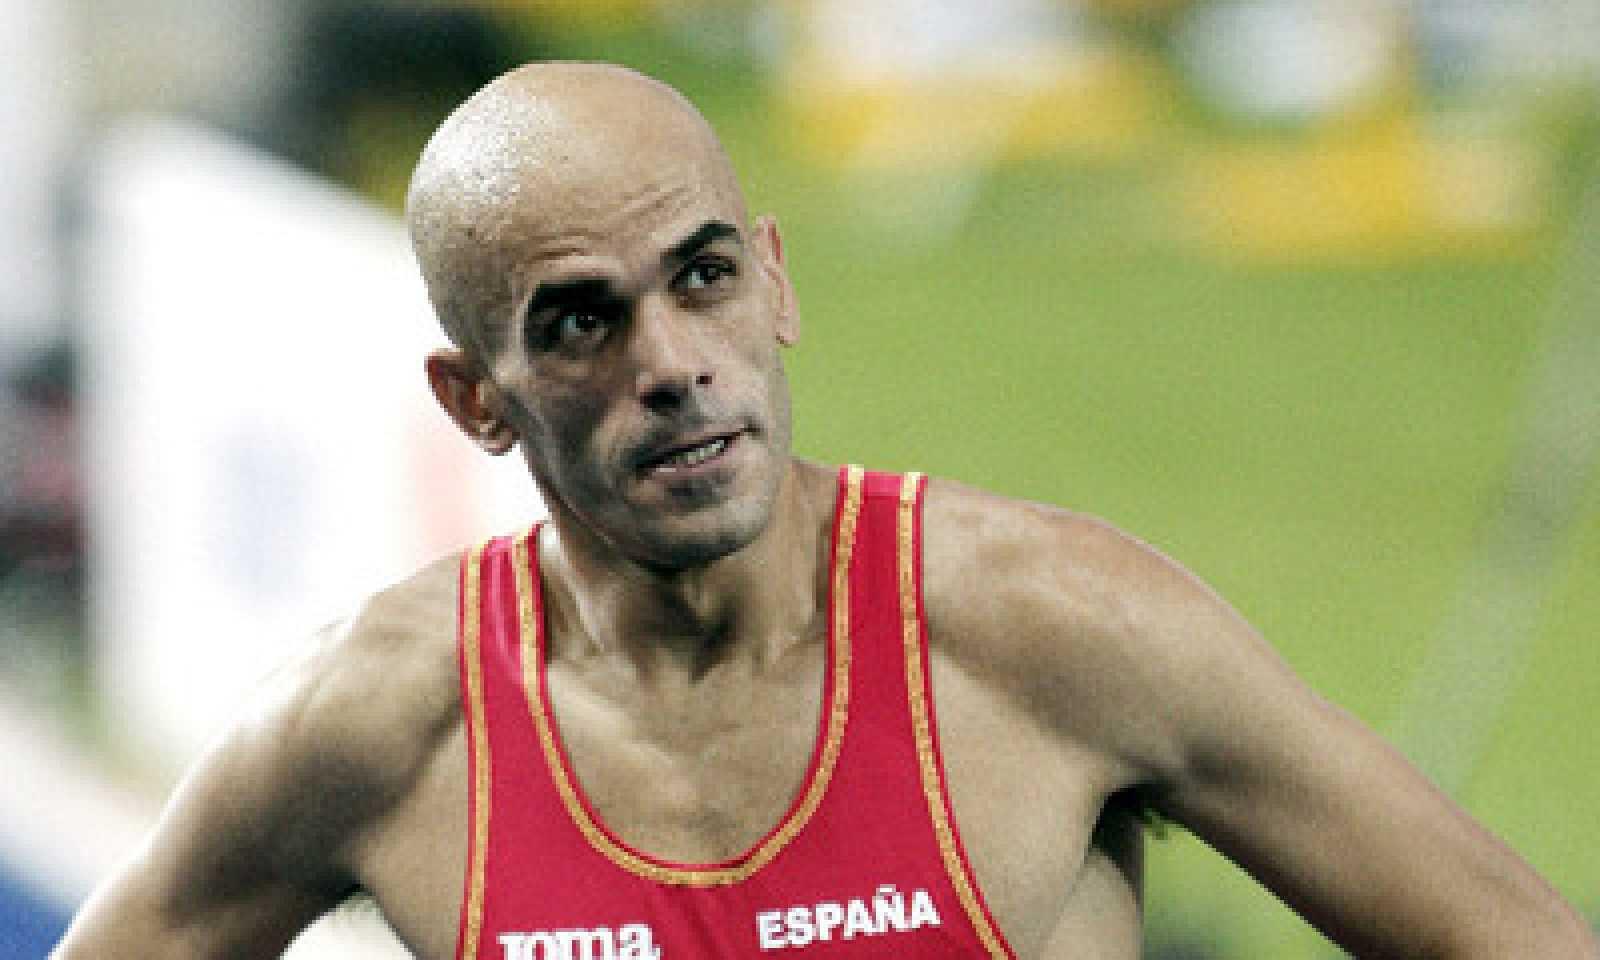 Pla mig de Reyes Estévez en una competició d'atletisme